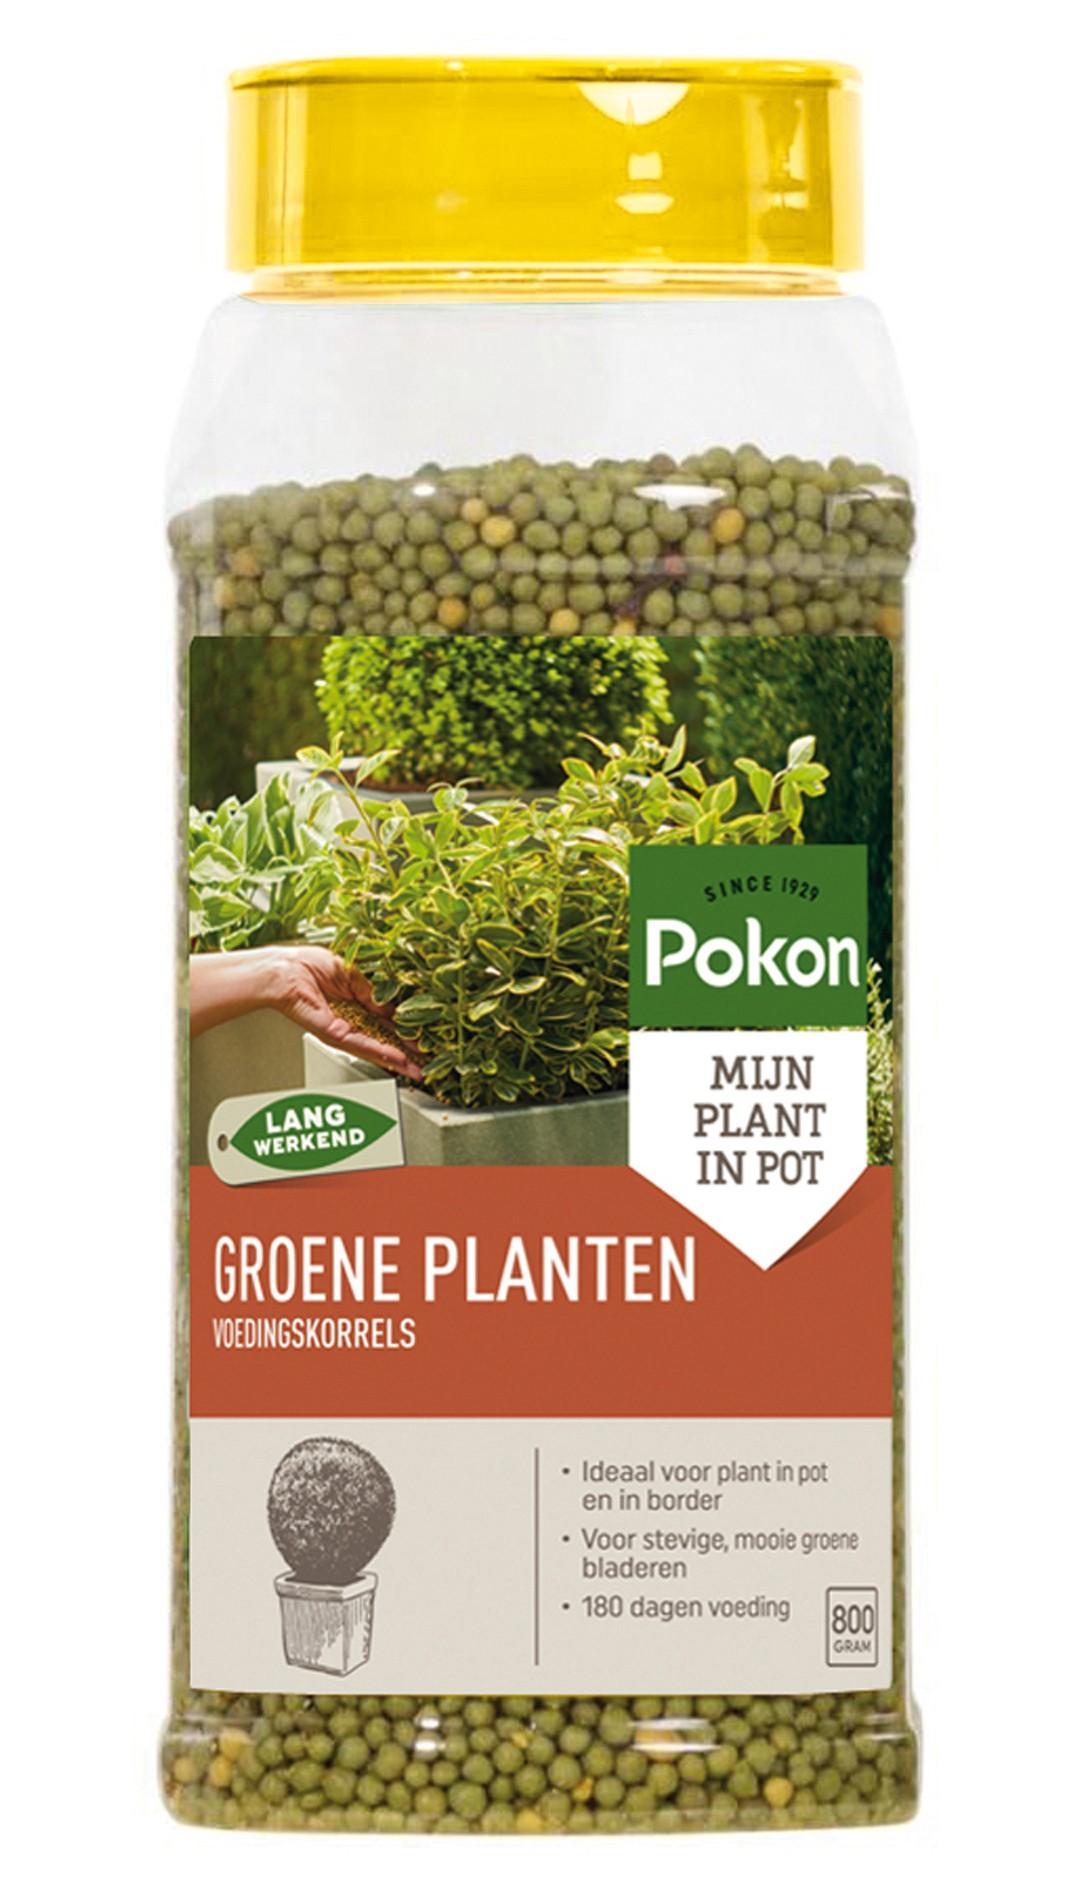 Groene Planten Voedingskorrels 800gr